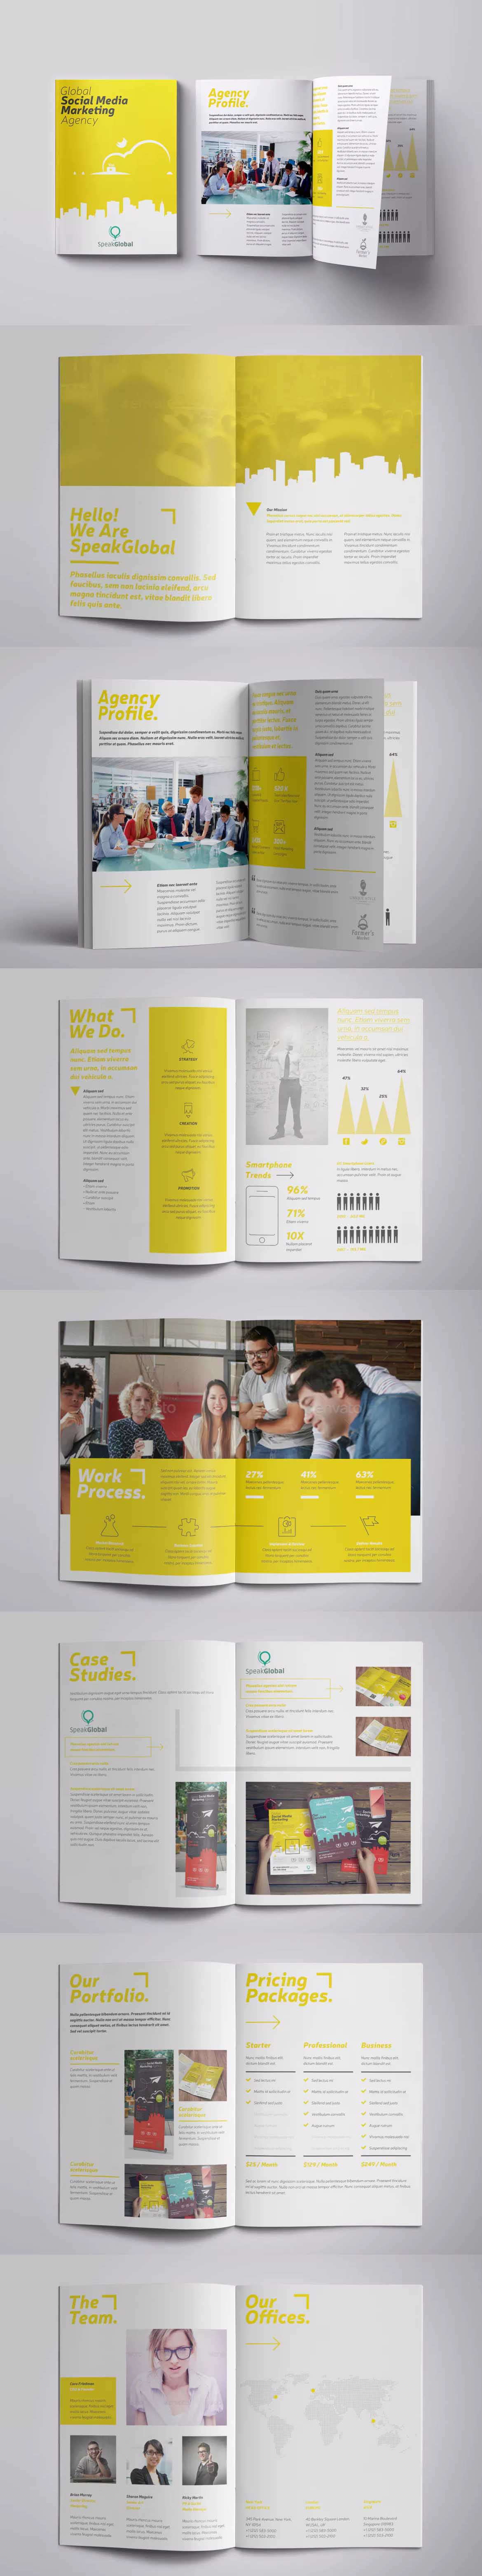 Social Media Brochure Template PSD, INDD A4 | Magazine layout ...